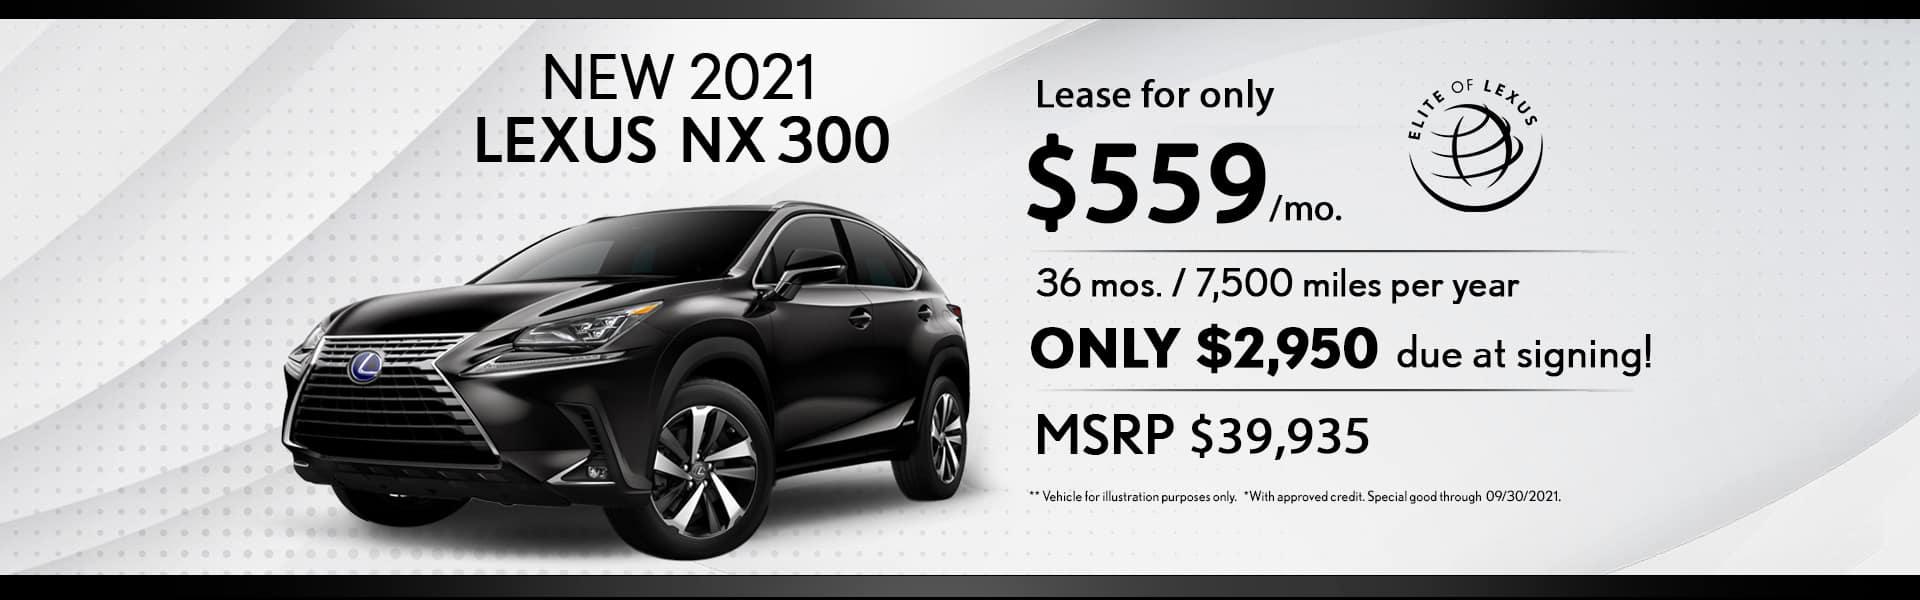 Lexus Lease special NX 300